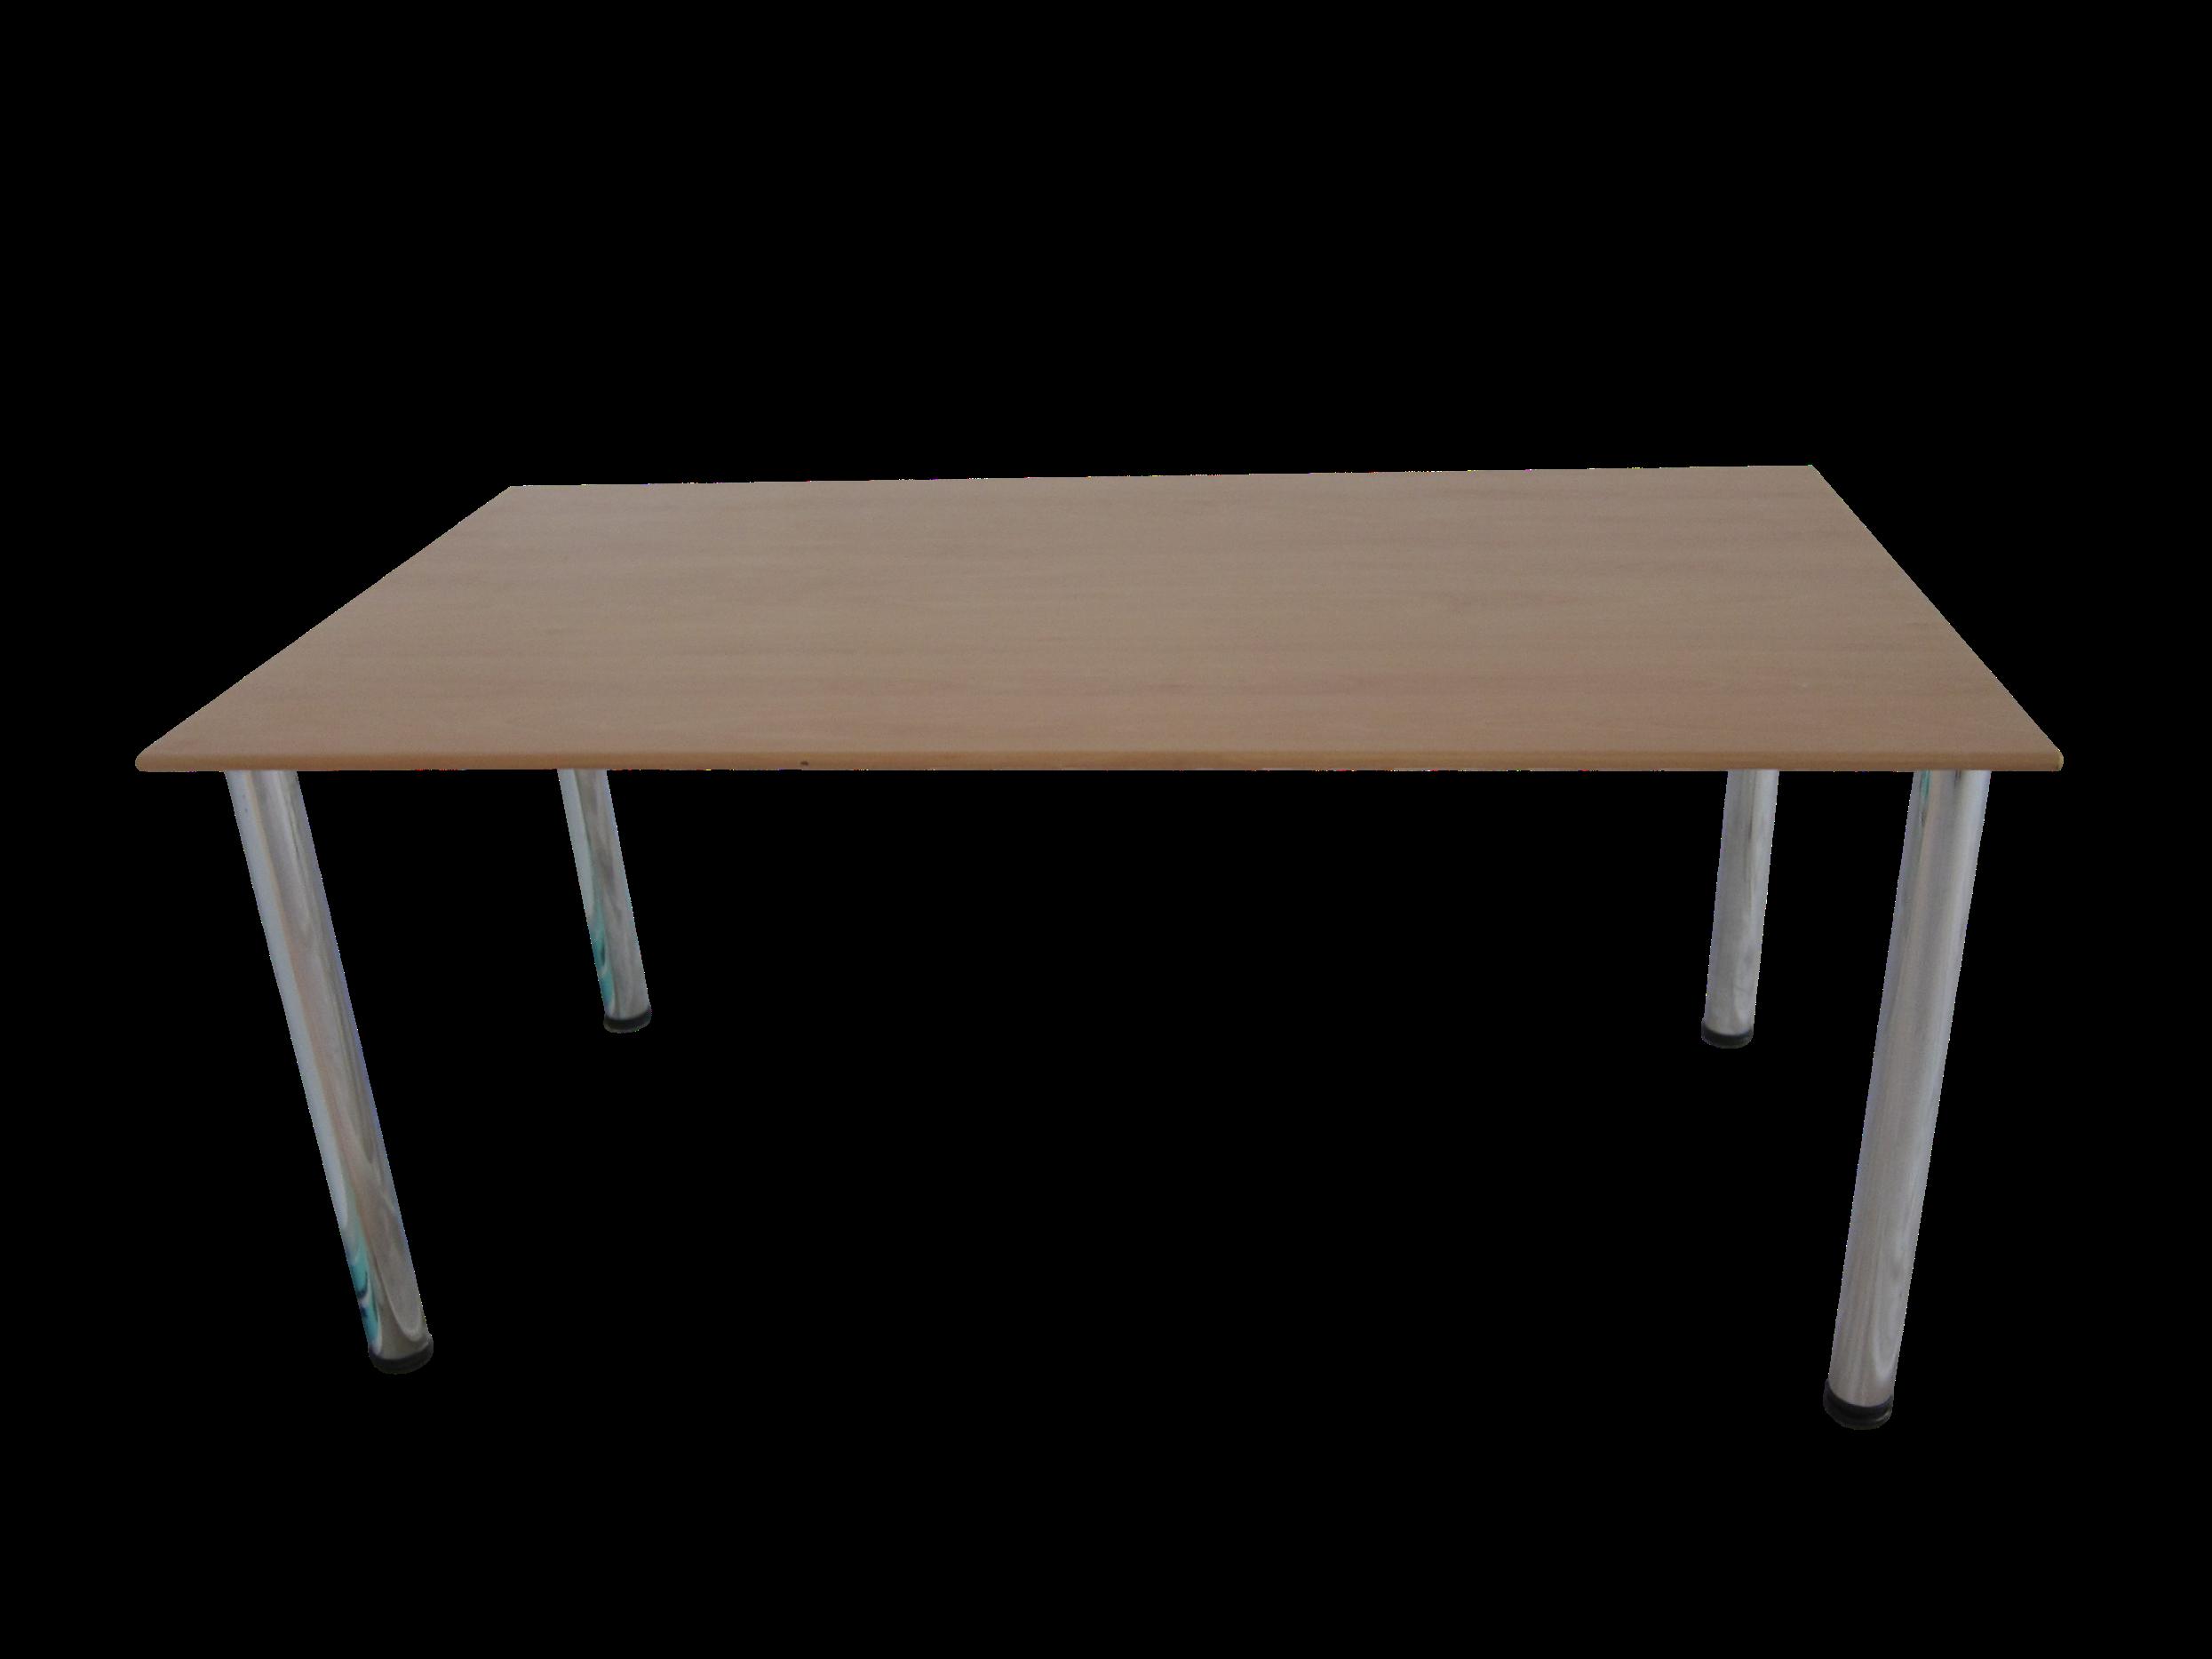 bureaux occasion tr s robustes adopte un bureau. Black Bedroom Furniture Sets. Home Design Ideas